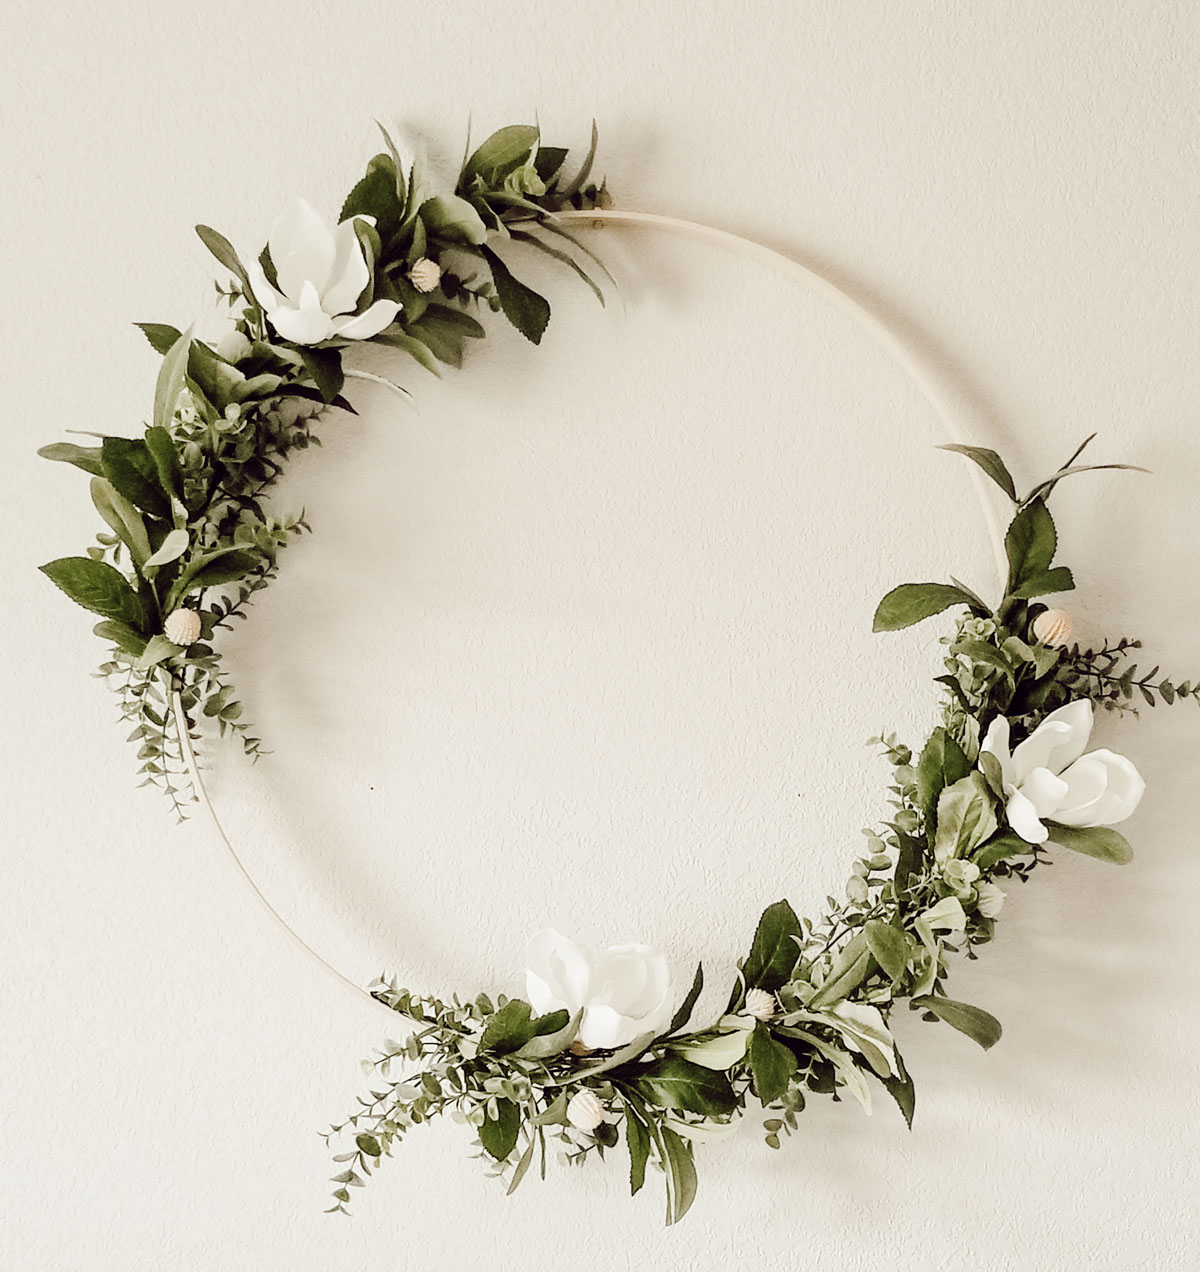 How to create a modern farmhouse wreath